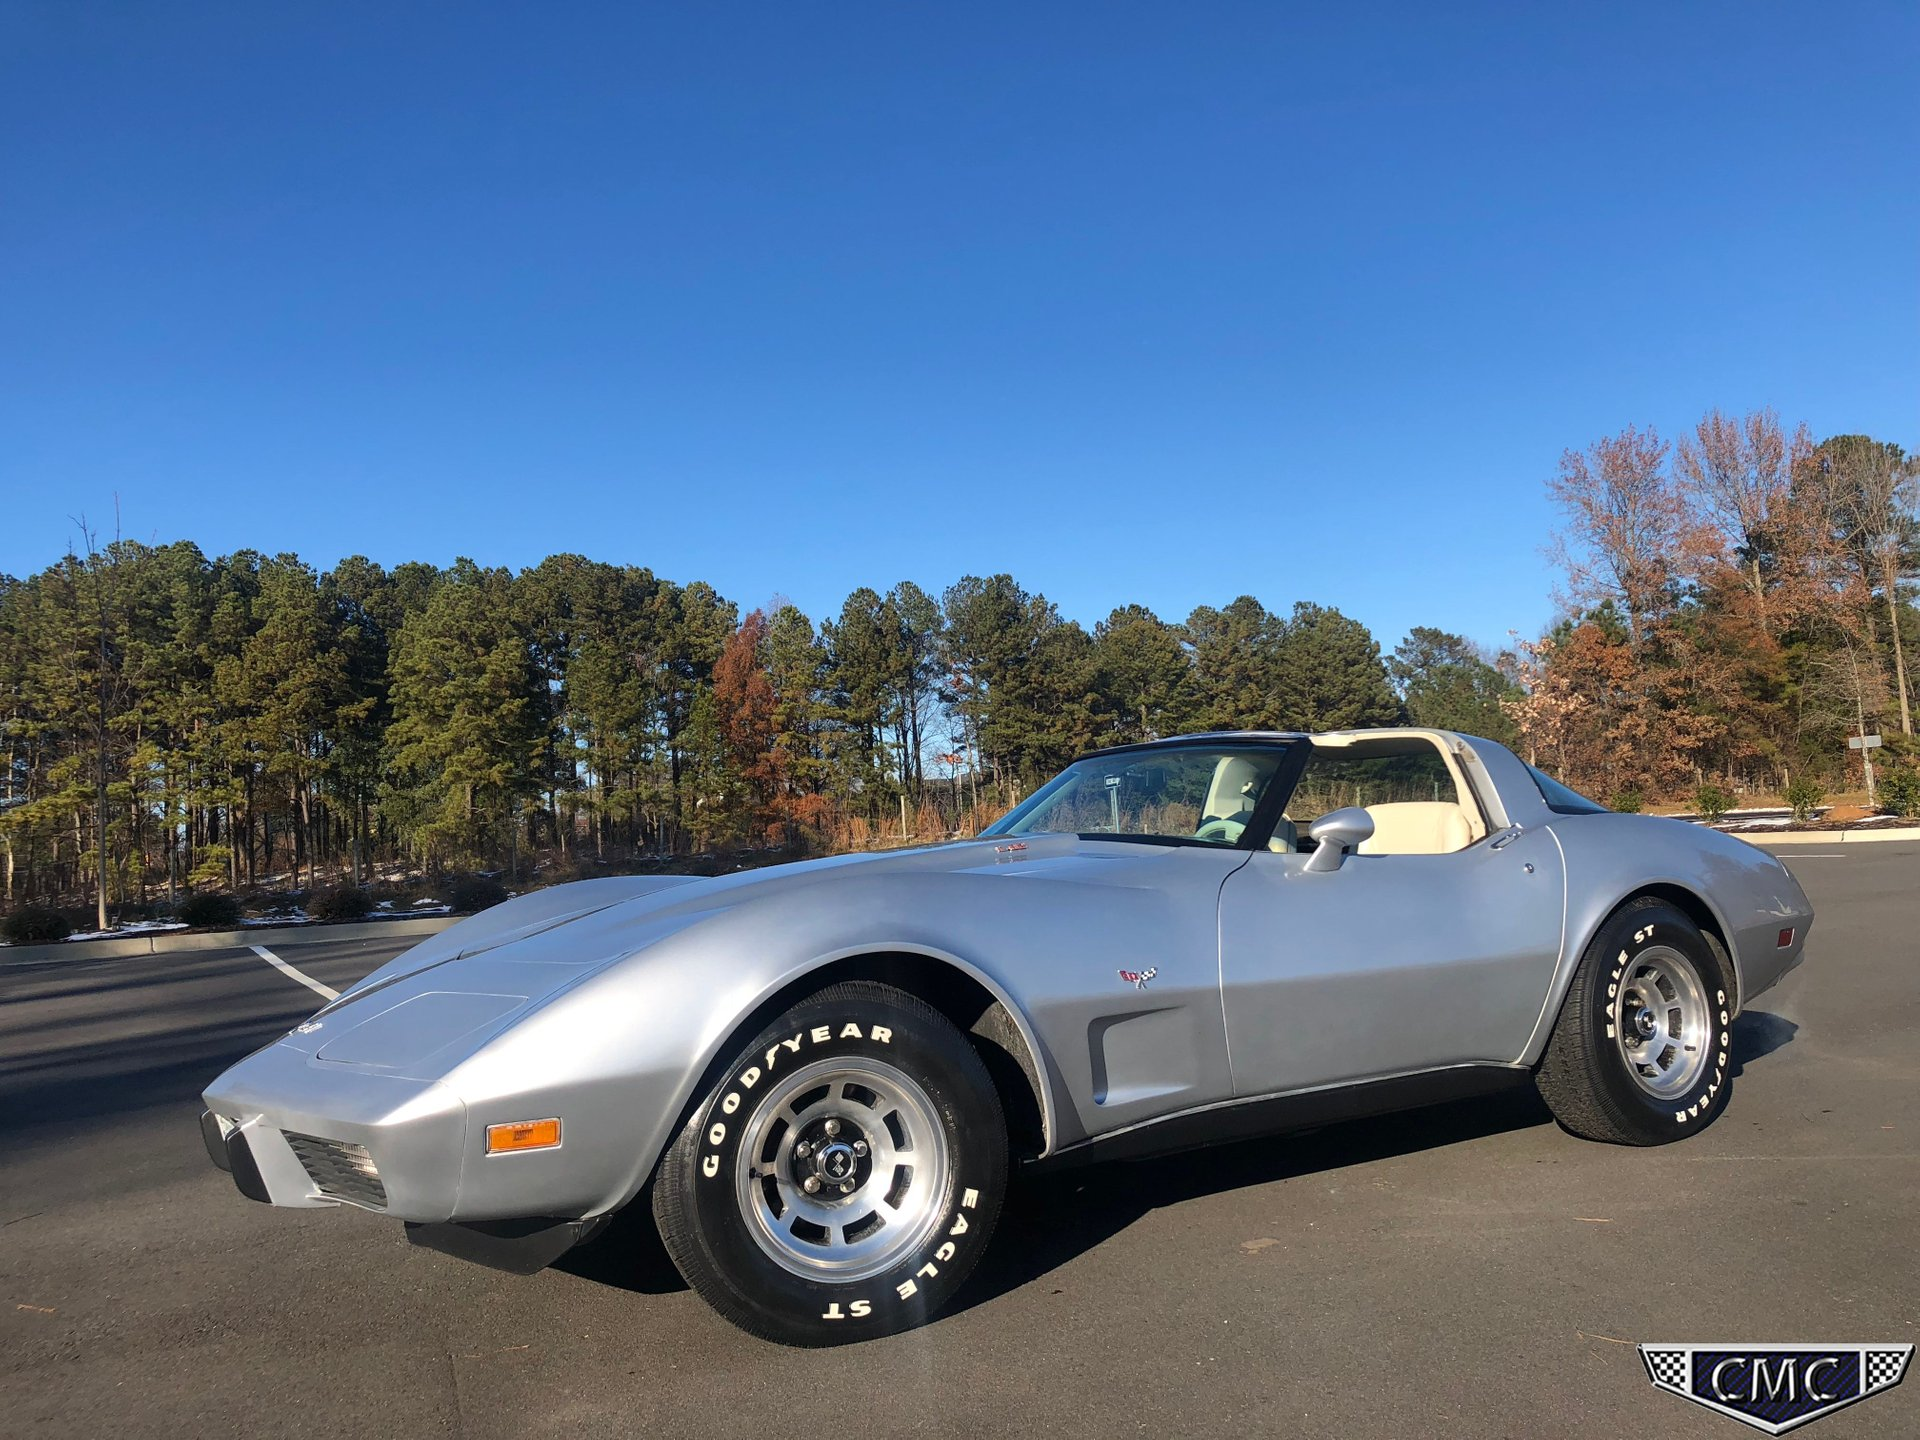 1979 Chevrolet Corvette Carolina Muscle Cars Inc